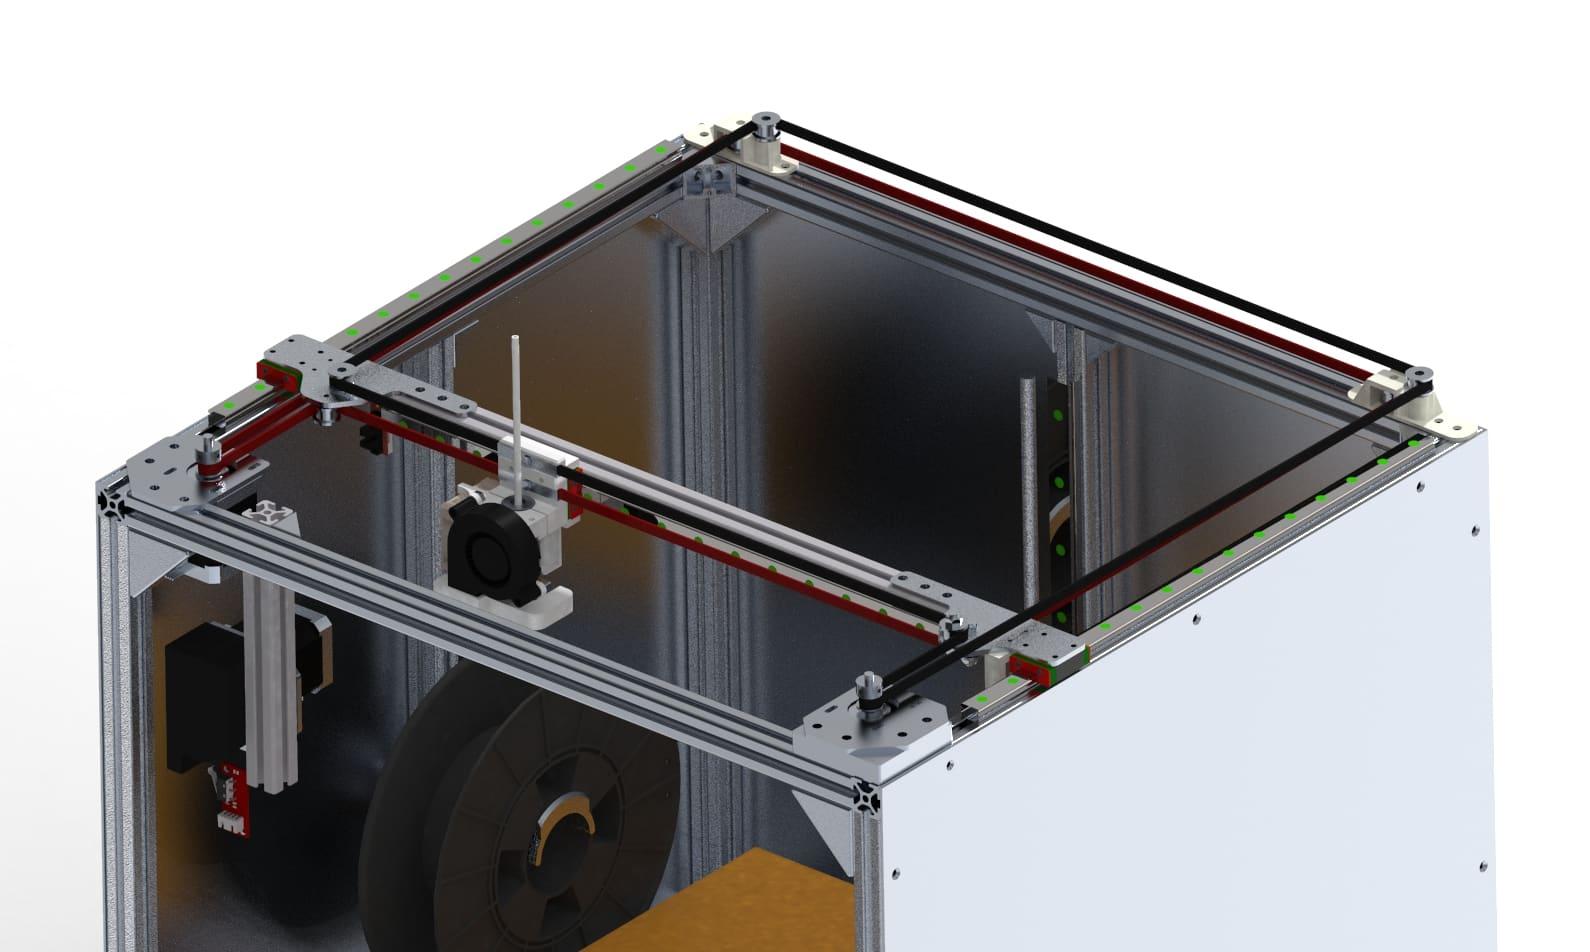 corexy gantry with linear rails